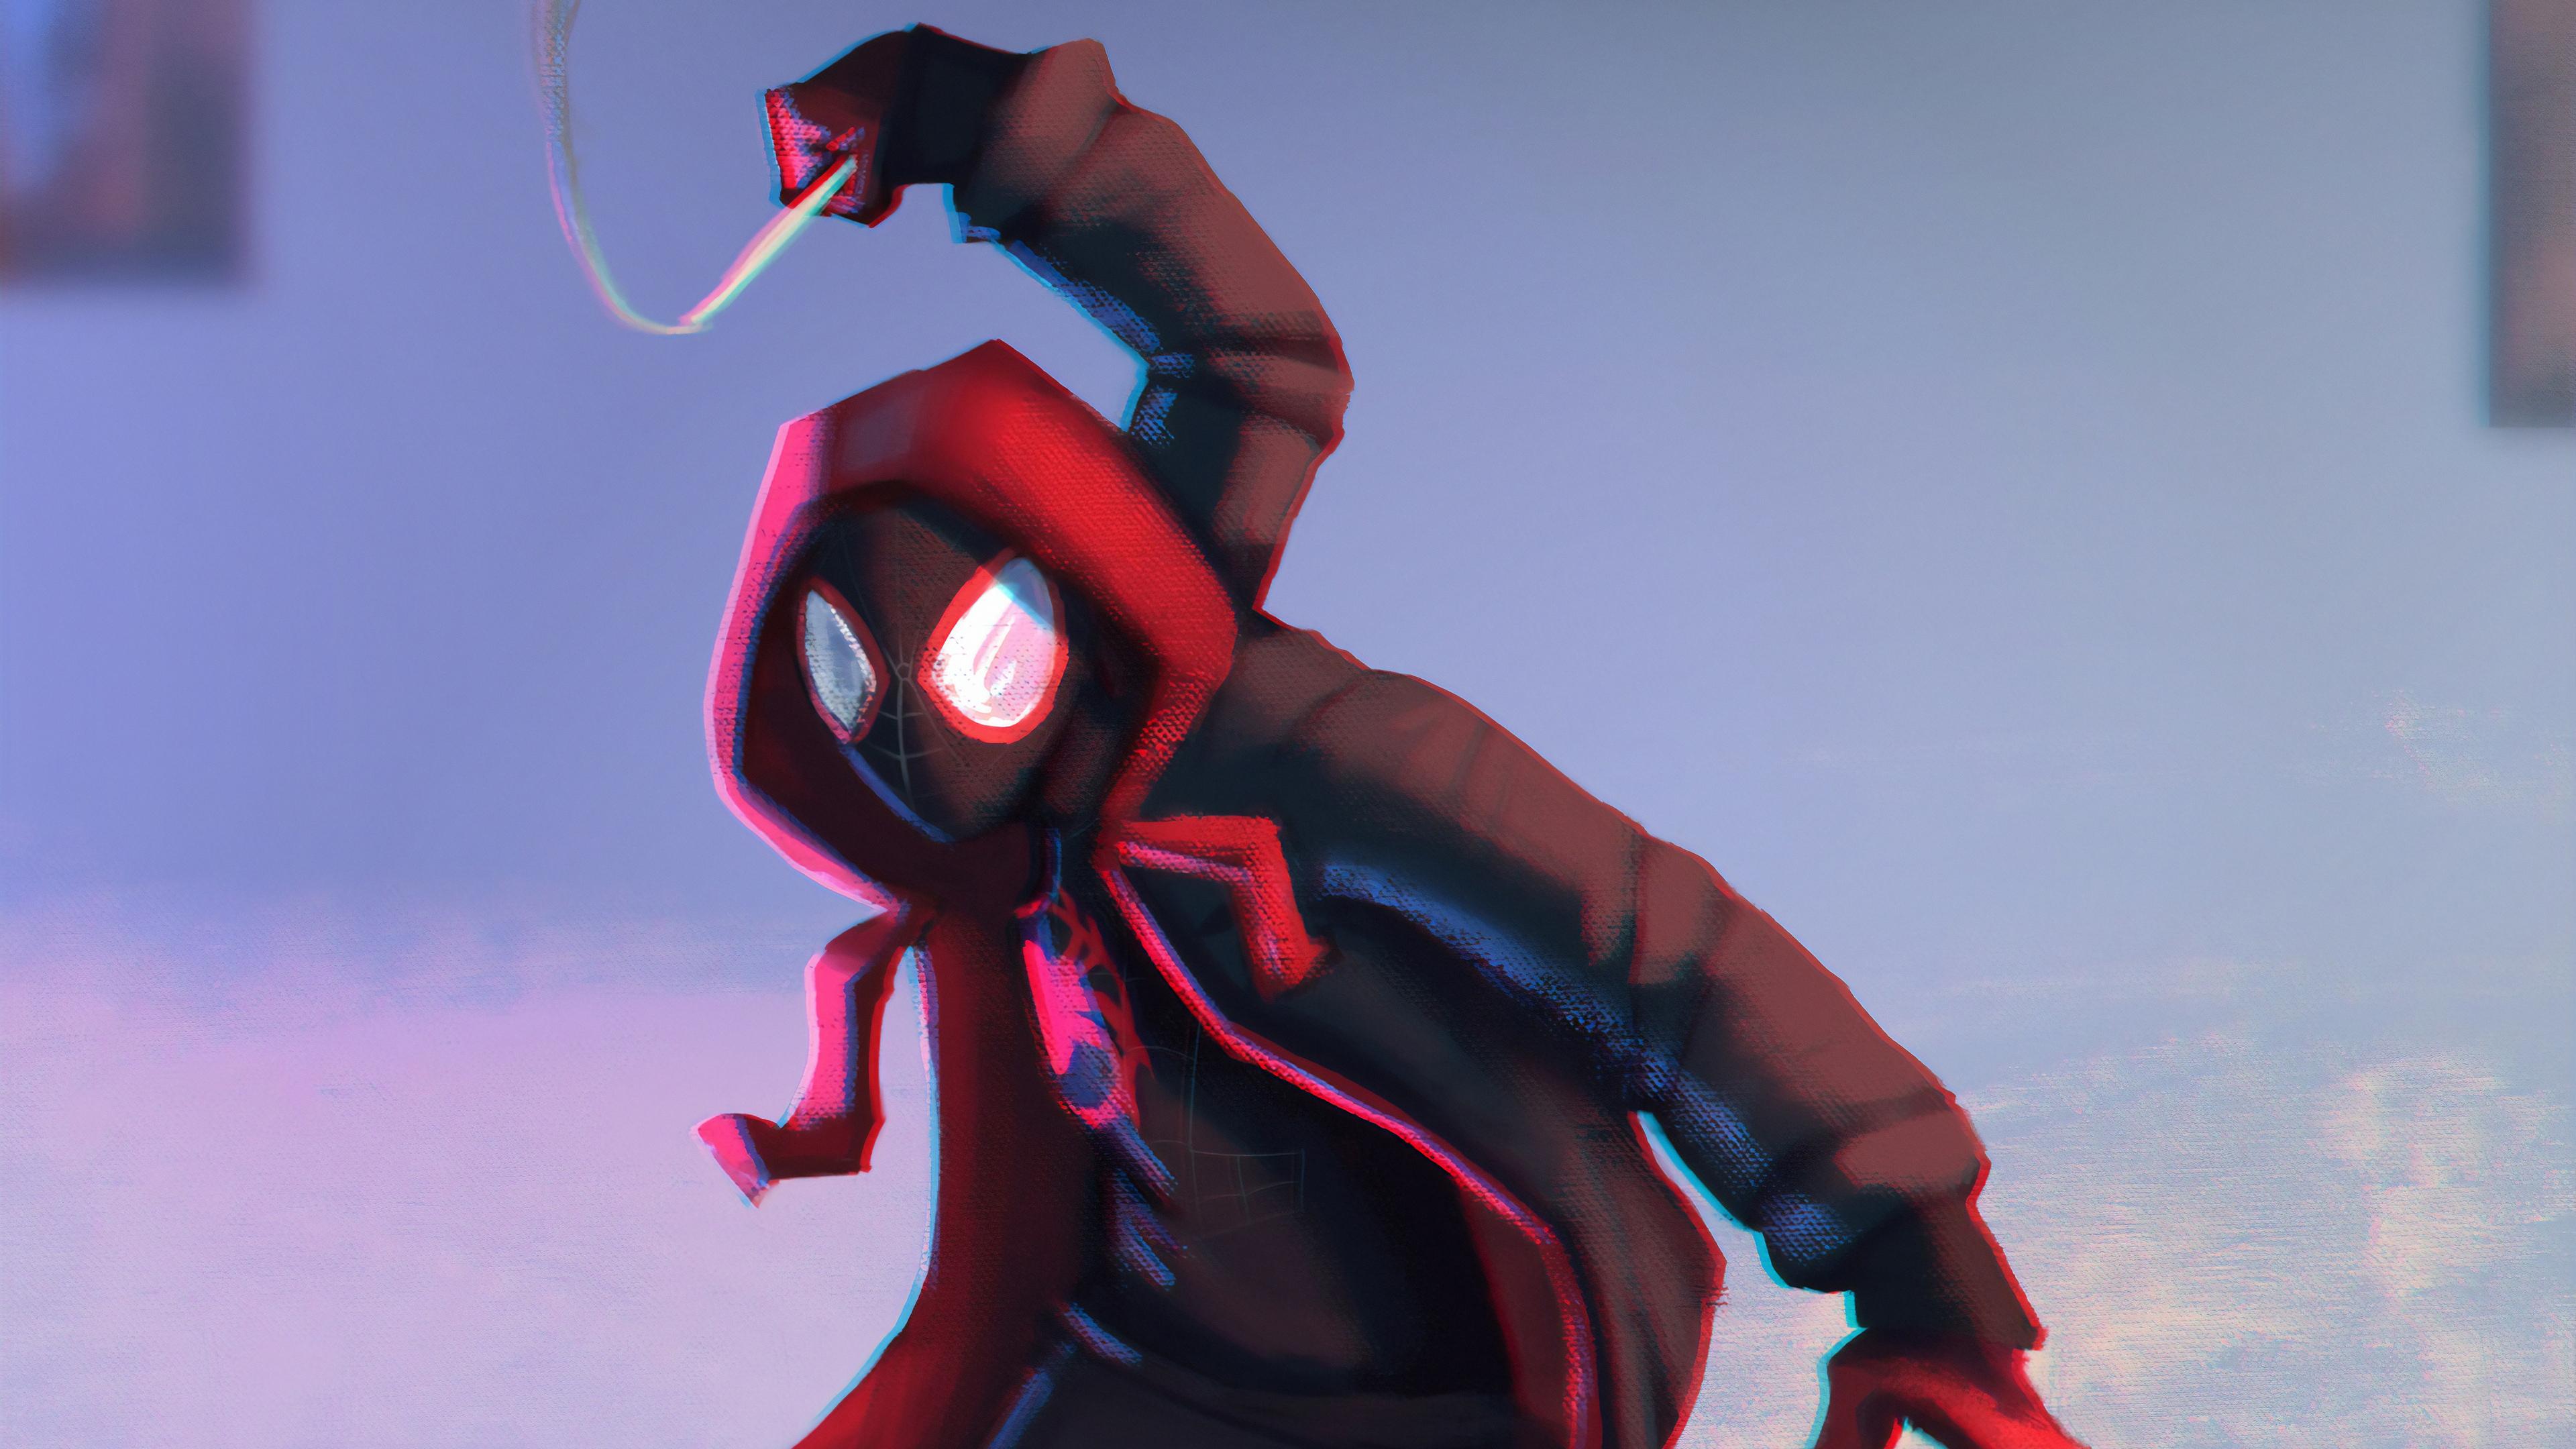 art spiderman miles morales 1572368598 - Art Spiderman Miles Morales - superheroes wallpapers, spiderman wallpapers, hd-wallpapers, digital art wallpapers, artwork wallpapers, artstation wallpapers, art wallpapers, 4k-wallpapers